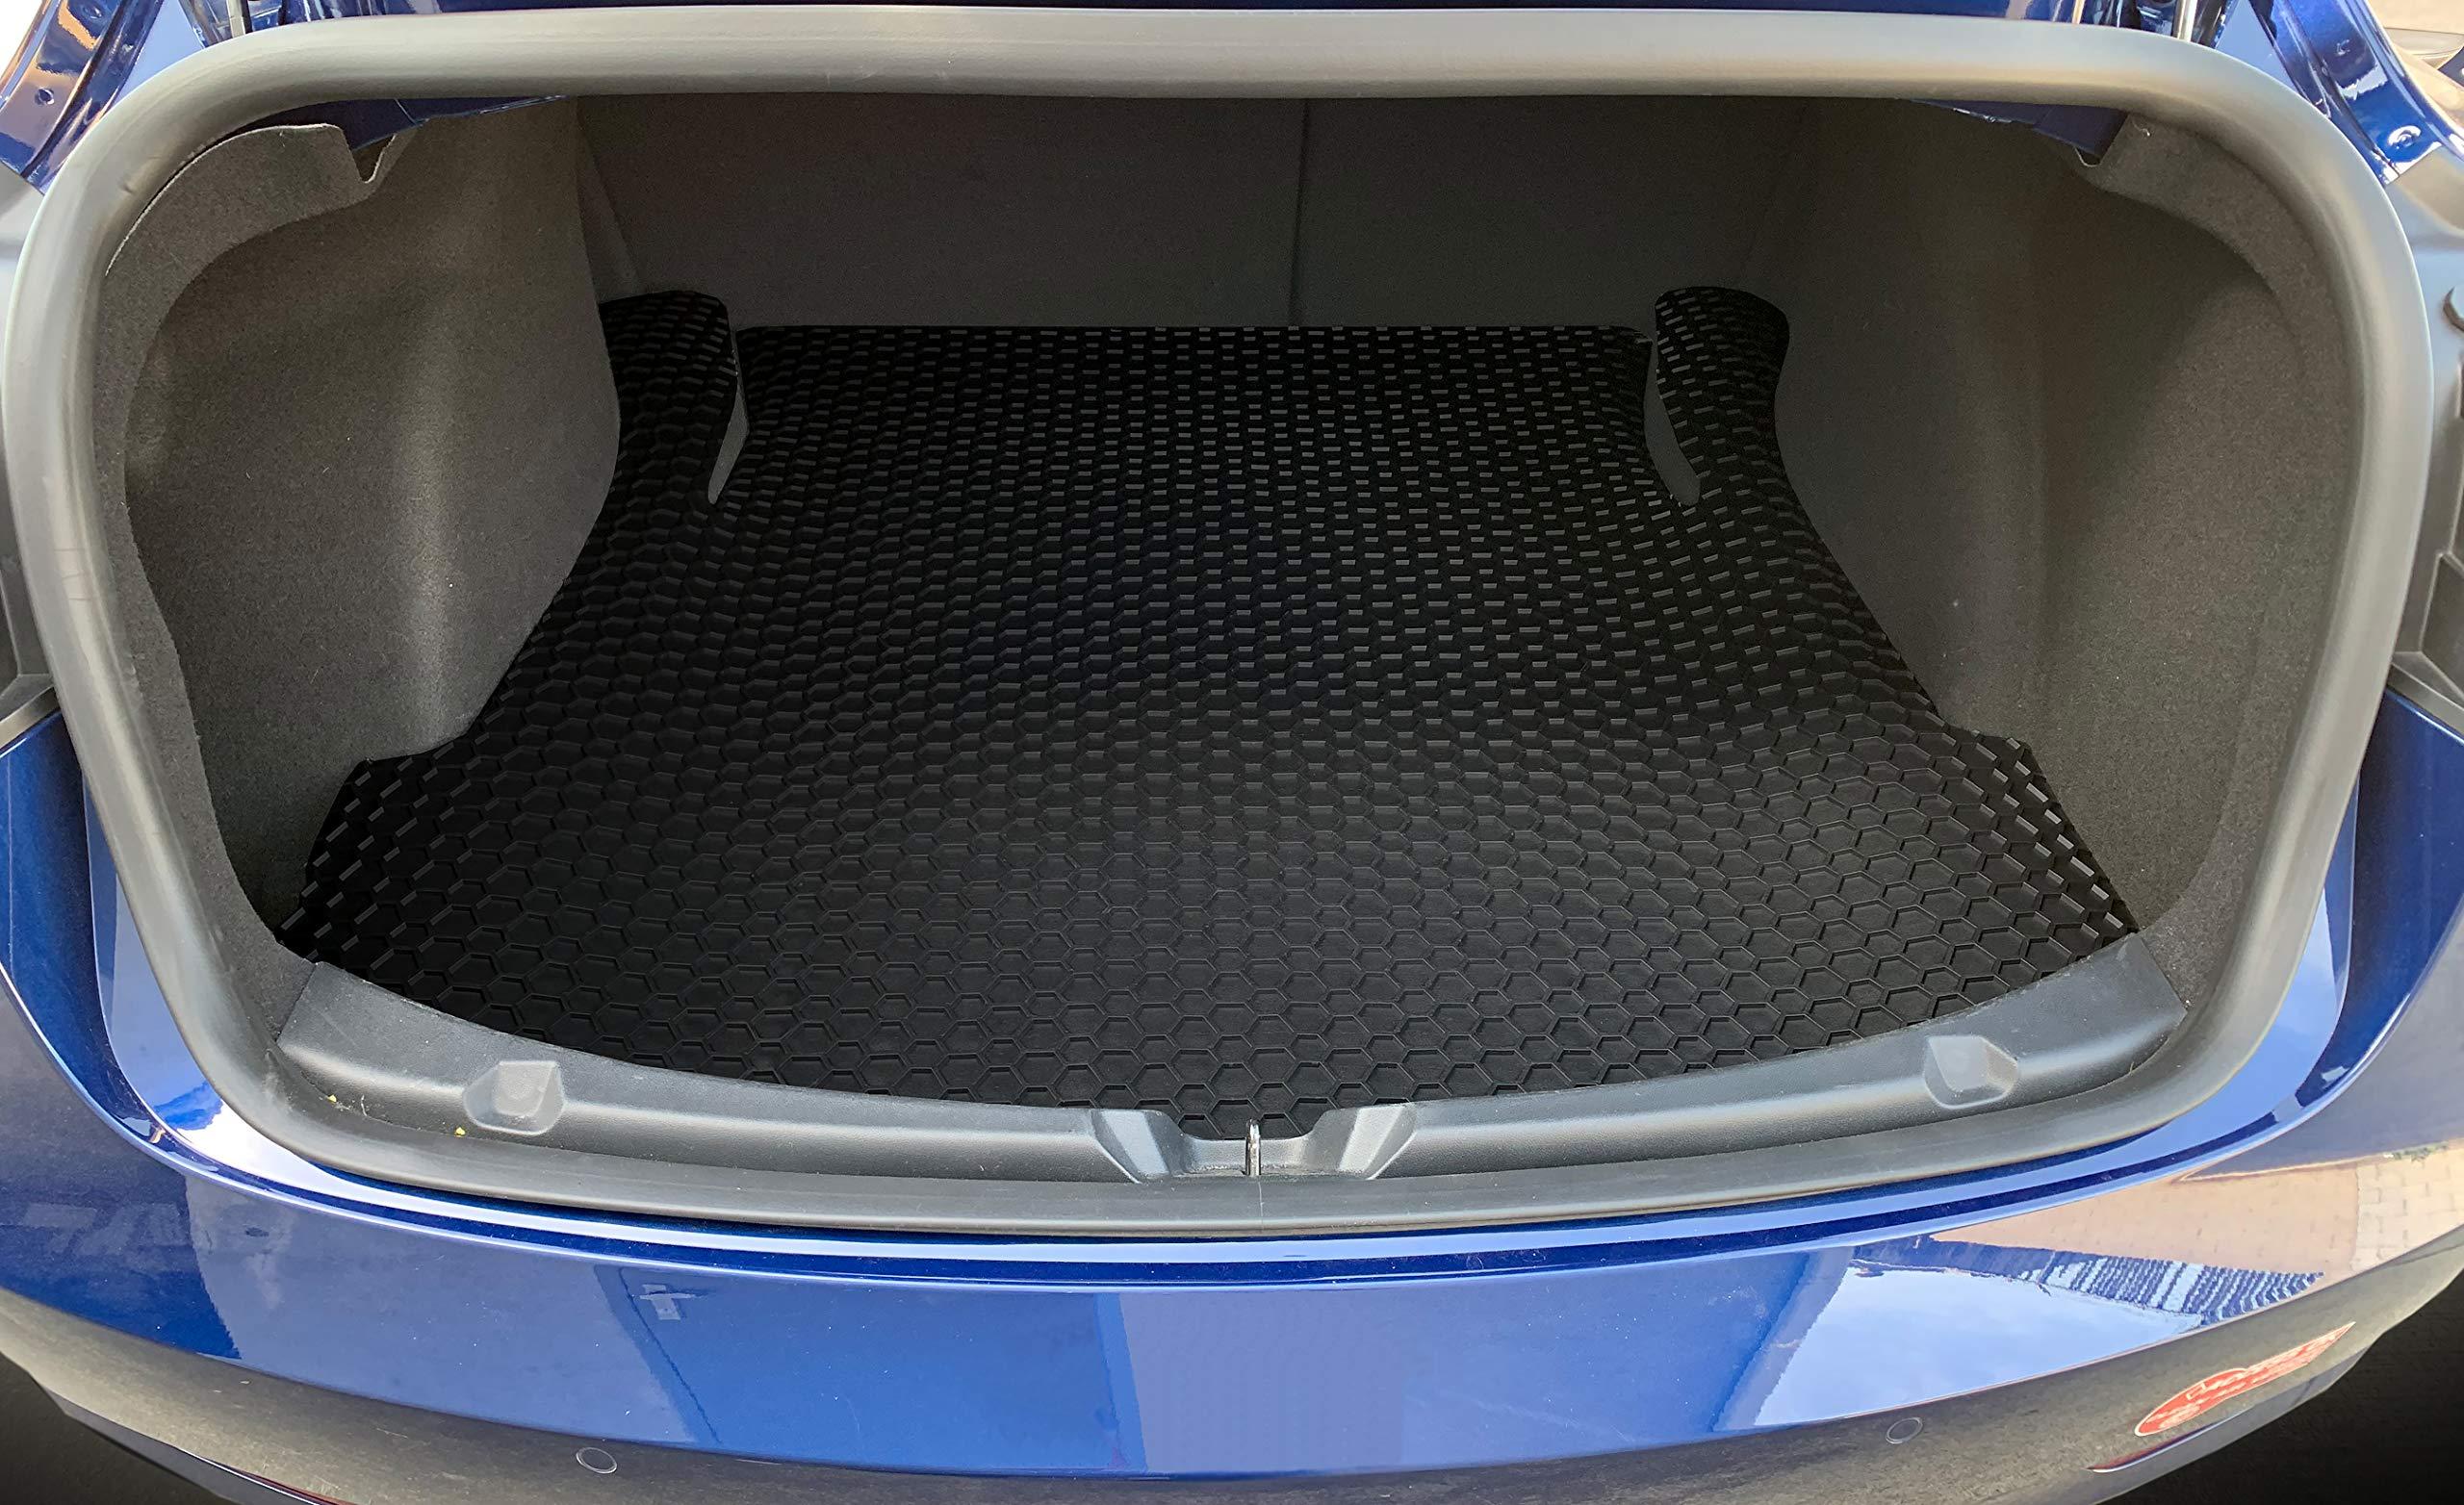 ToughPRO Tesla Model 3 Floor Mats Set - Frunk Mat - Trunk Mat- Storage Mat - All Weather - Heavy Duty - Black Rubber - (Made in The USA) - 2019 by ToughPRO (Image #4)